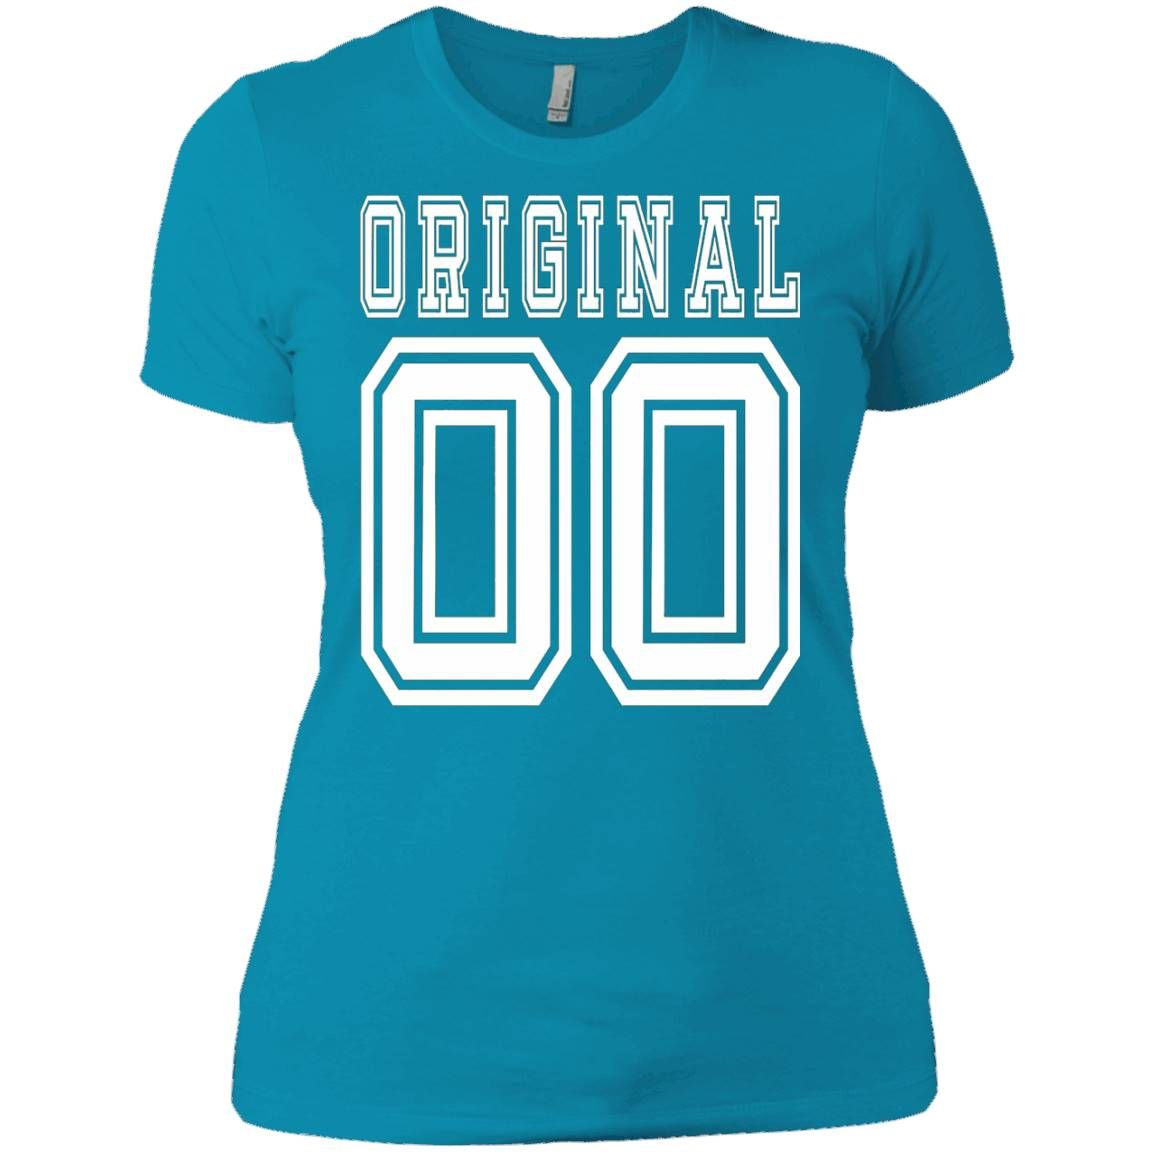 2000 T-shirt 17th Birthday Gift 17 Year Old Boy Girl B-day - T-Shirt #17thbirthday